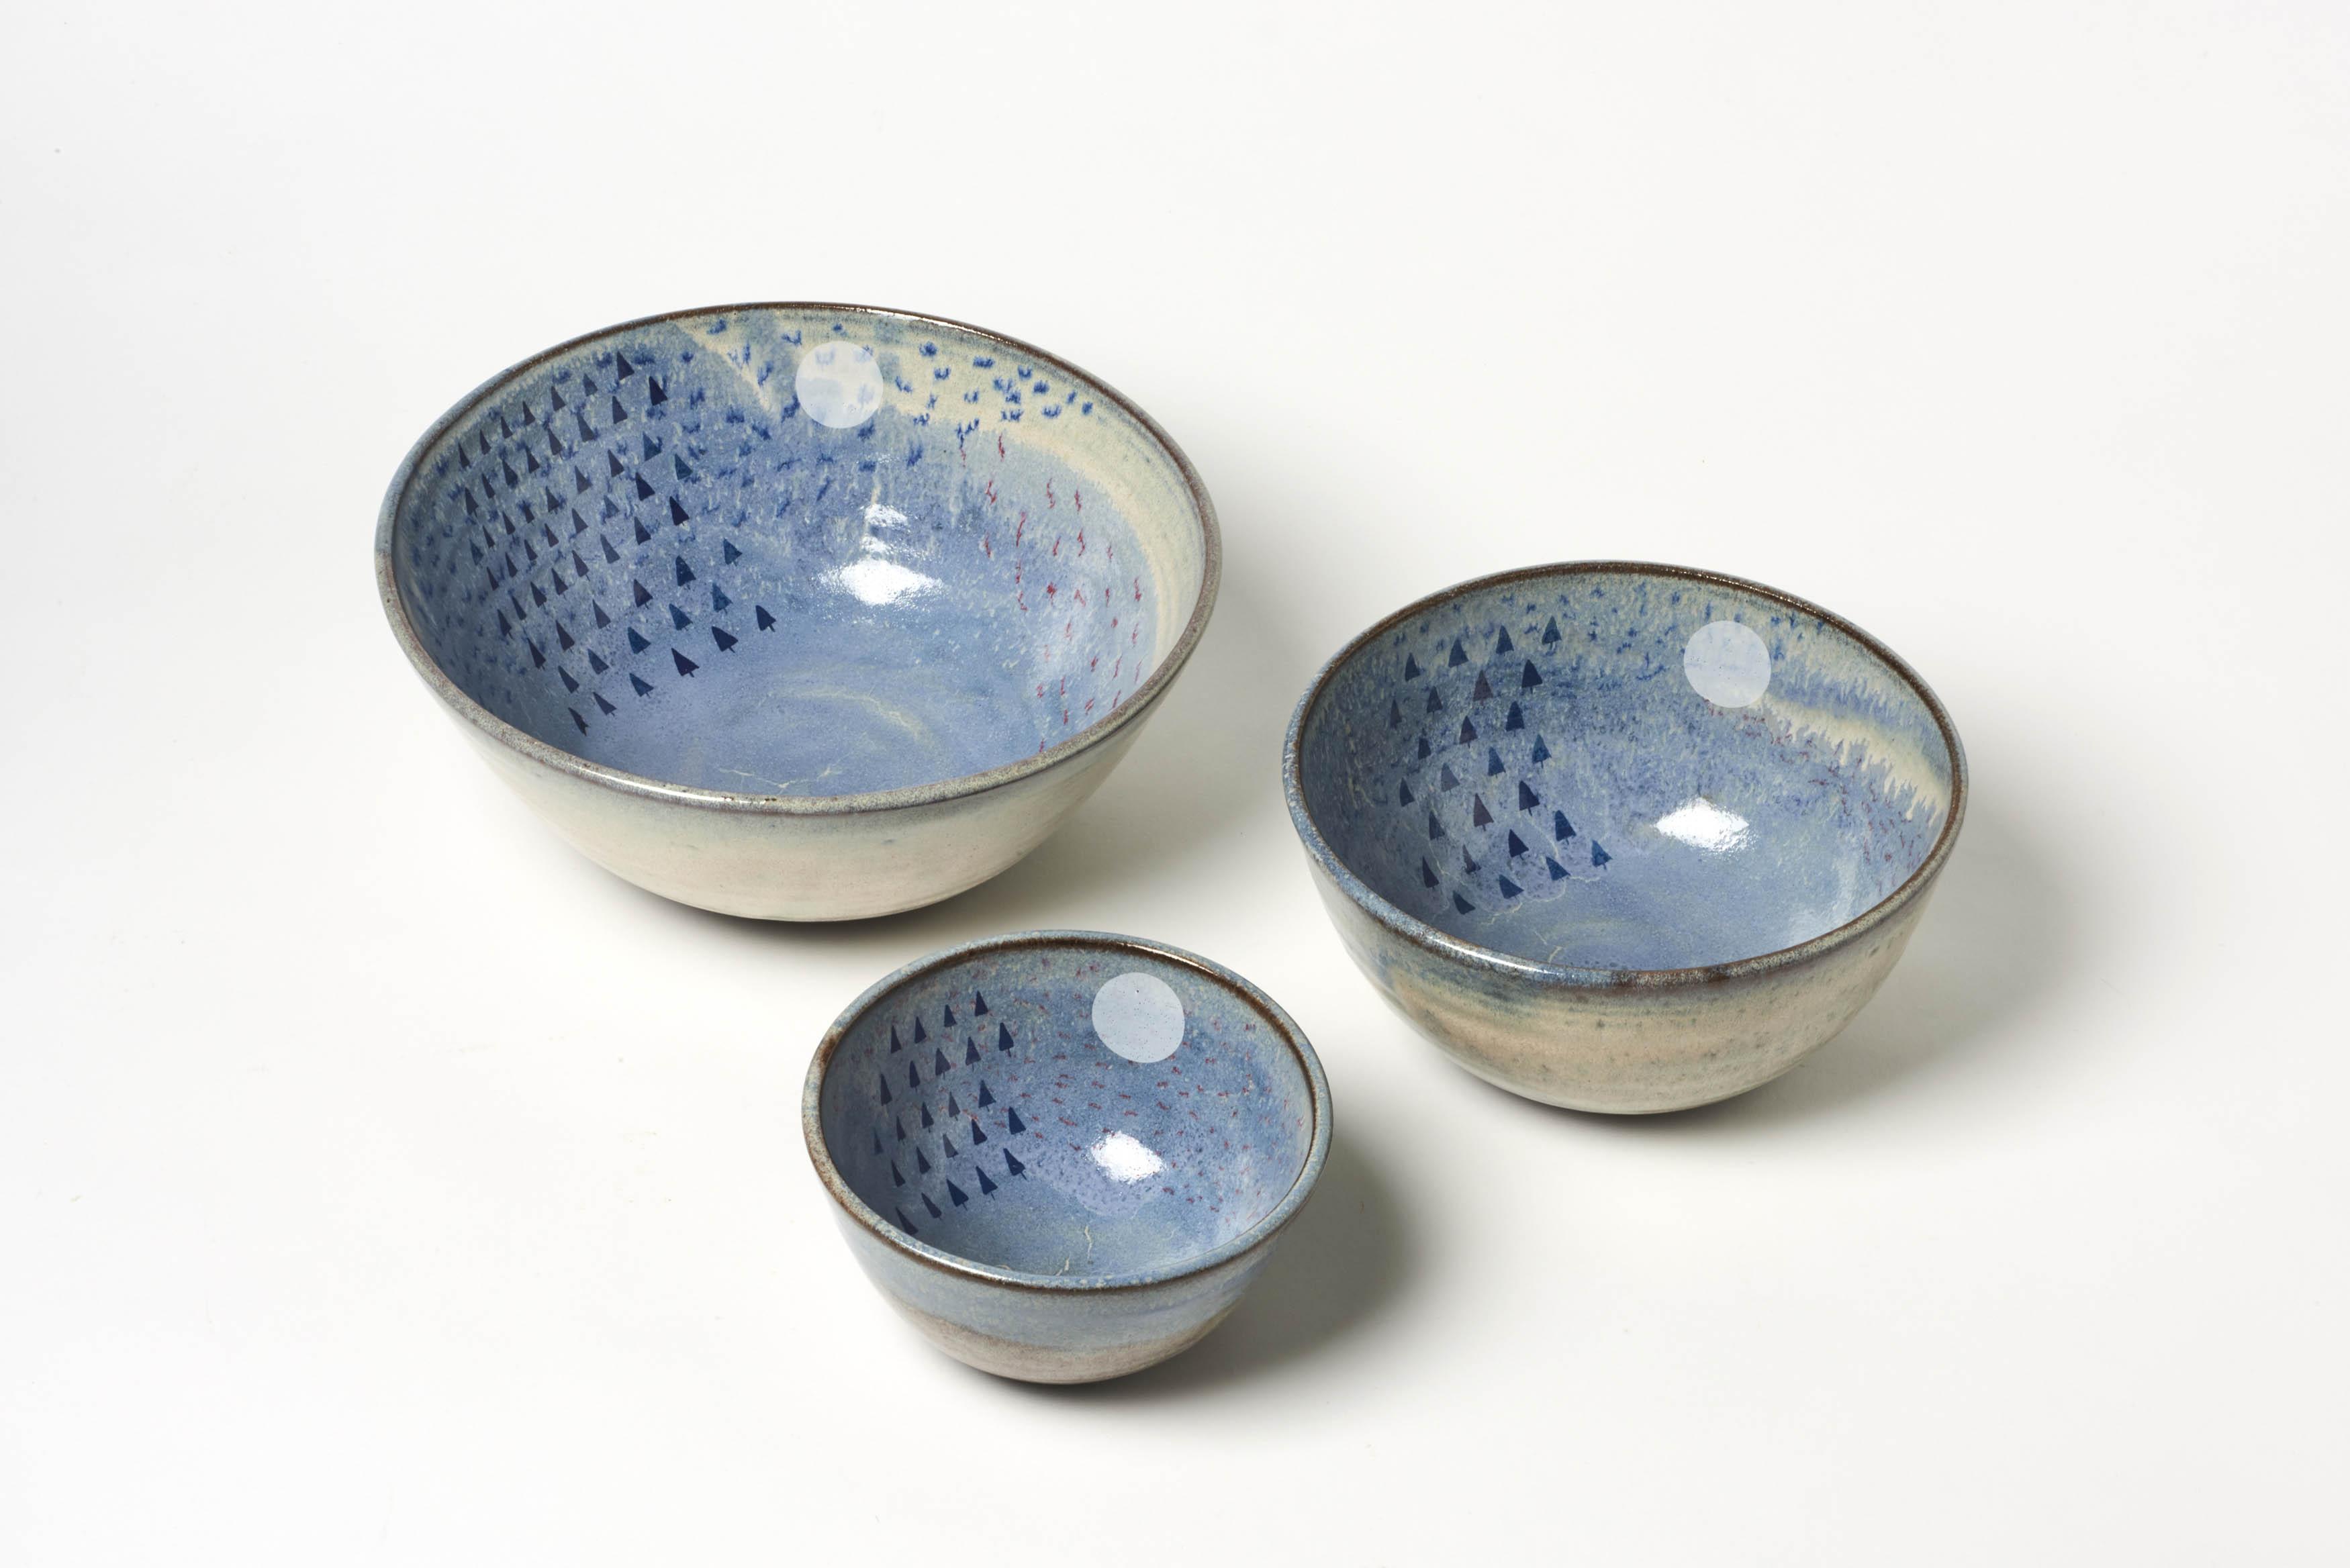 Blue Forest Nesting Bowls